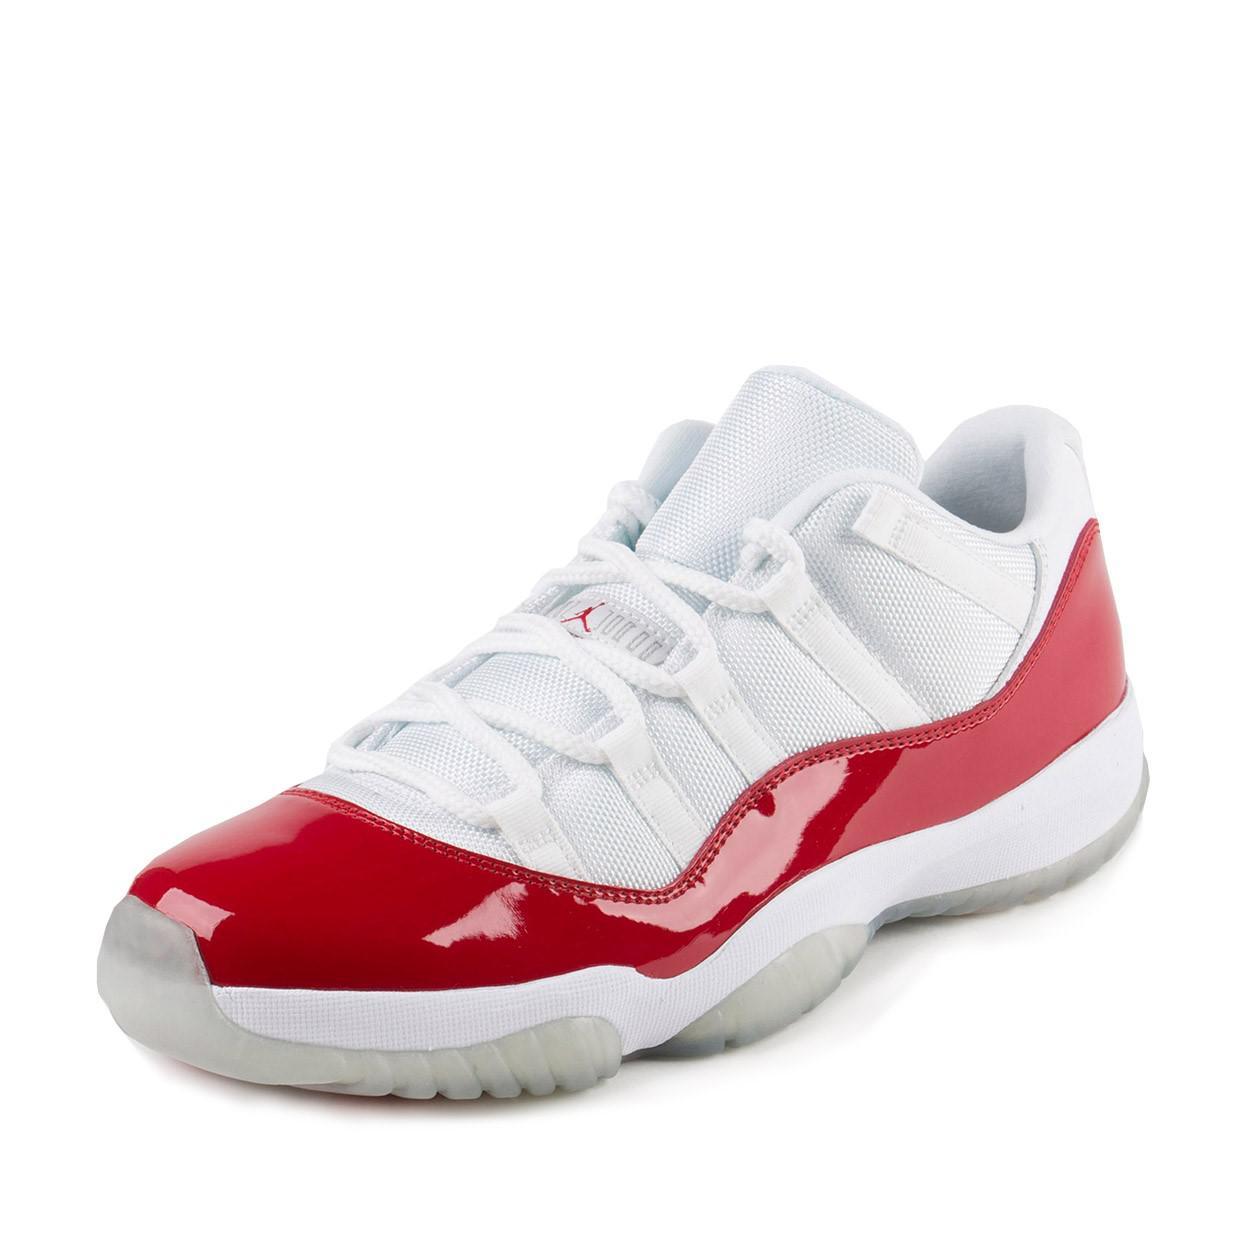 34a2d31f1a14 Lyst - Nike Mens Air Jordan 11 Retro Low White varsity Red-black ...